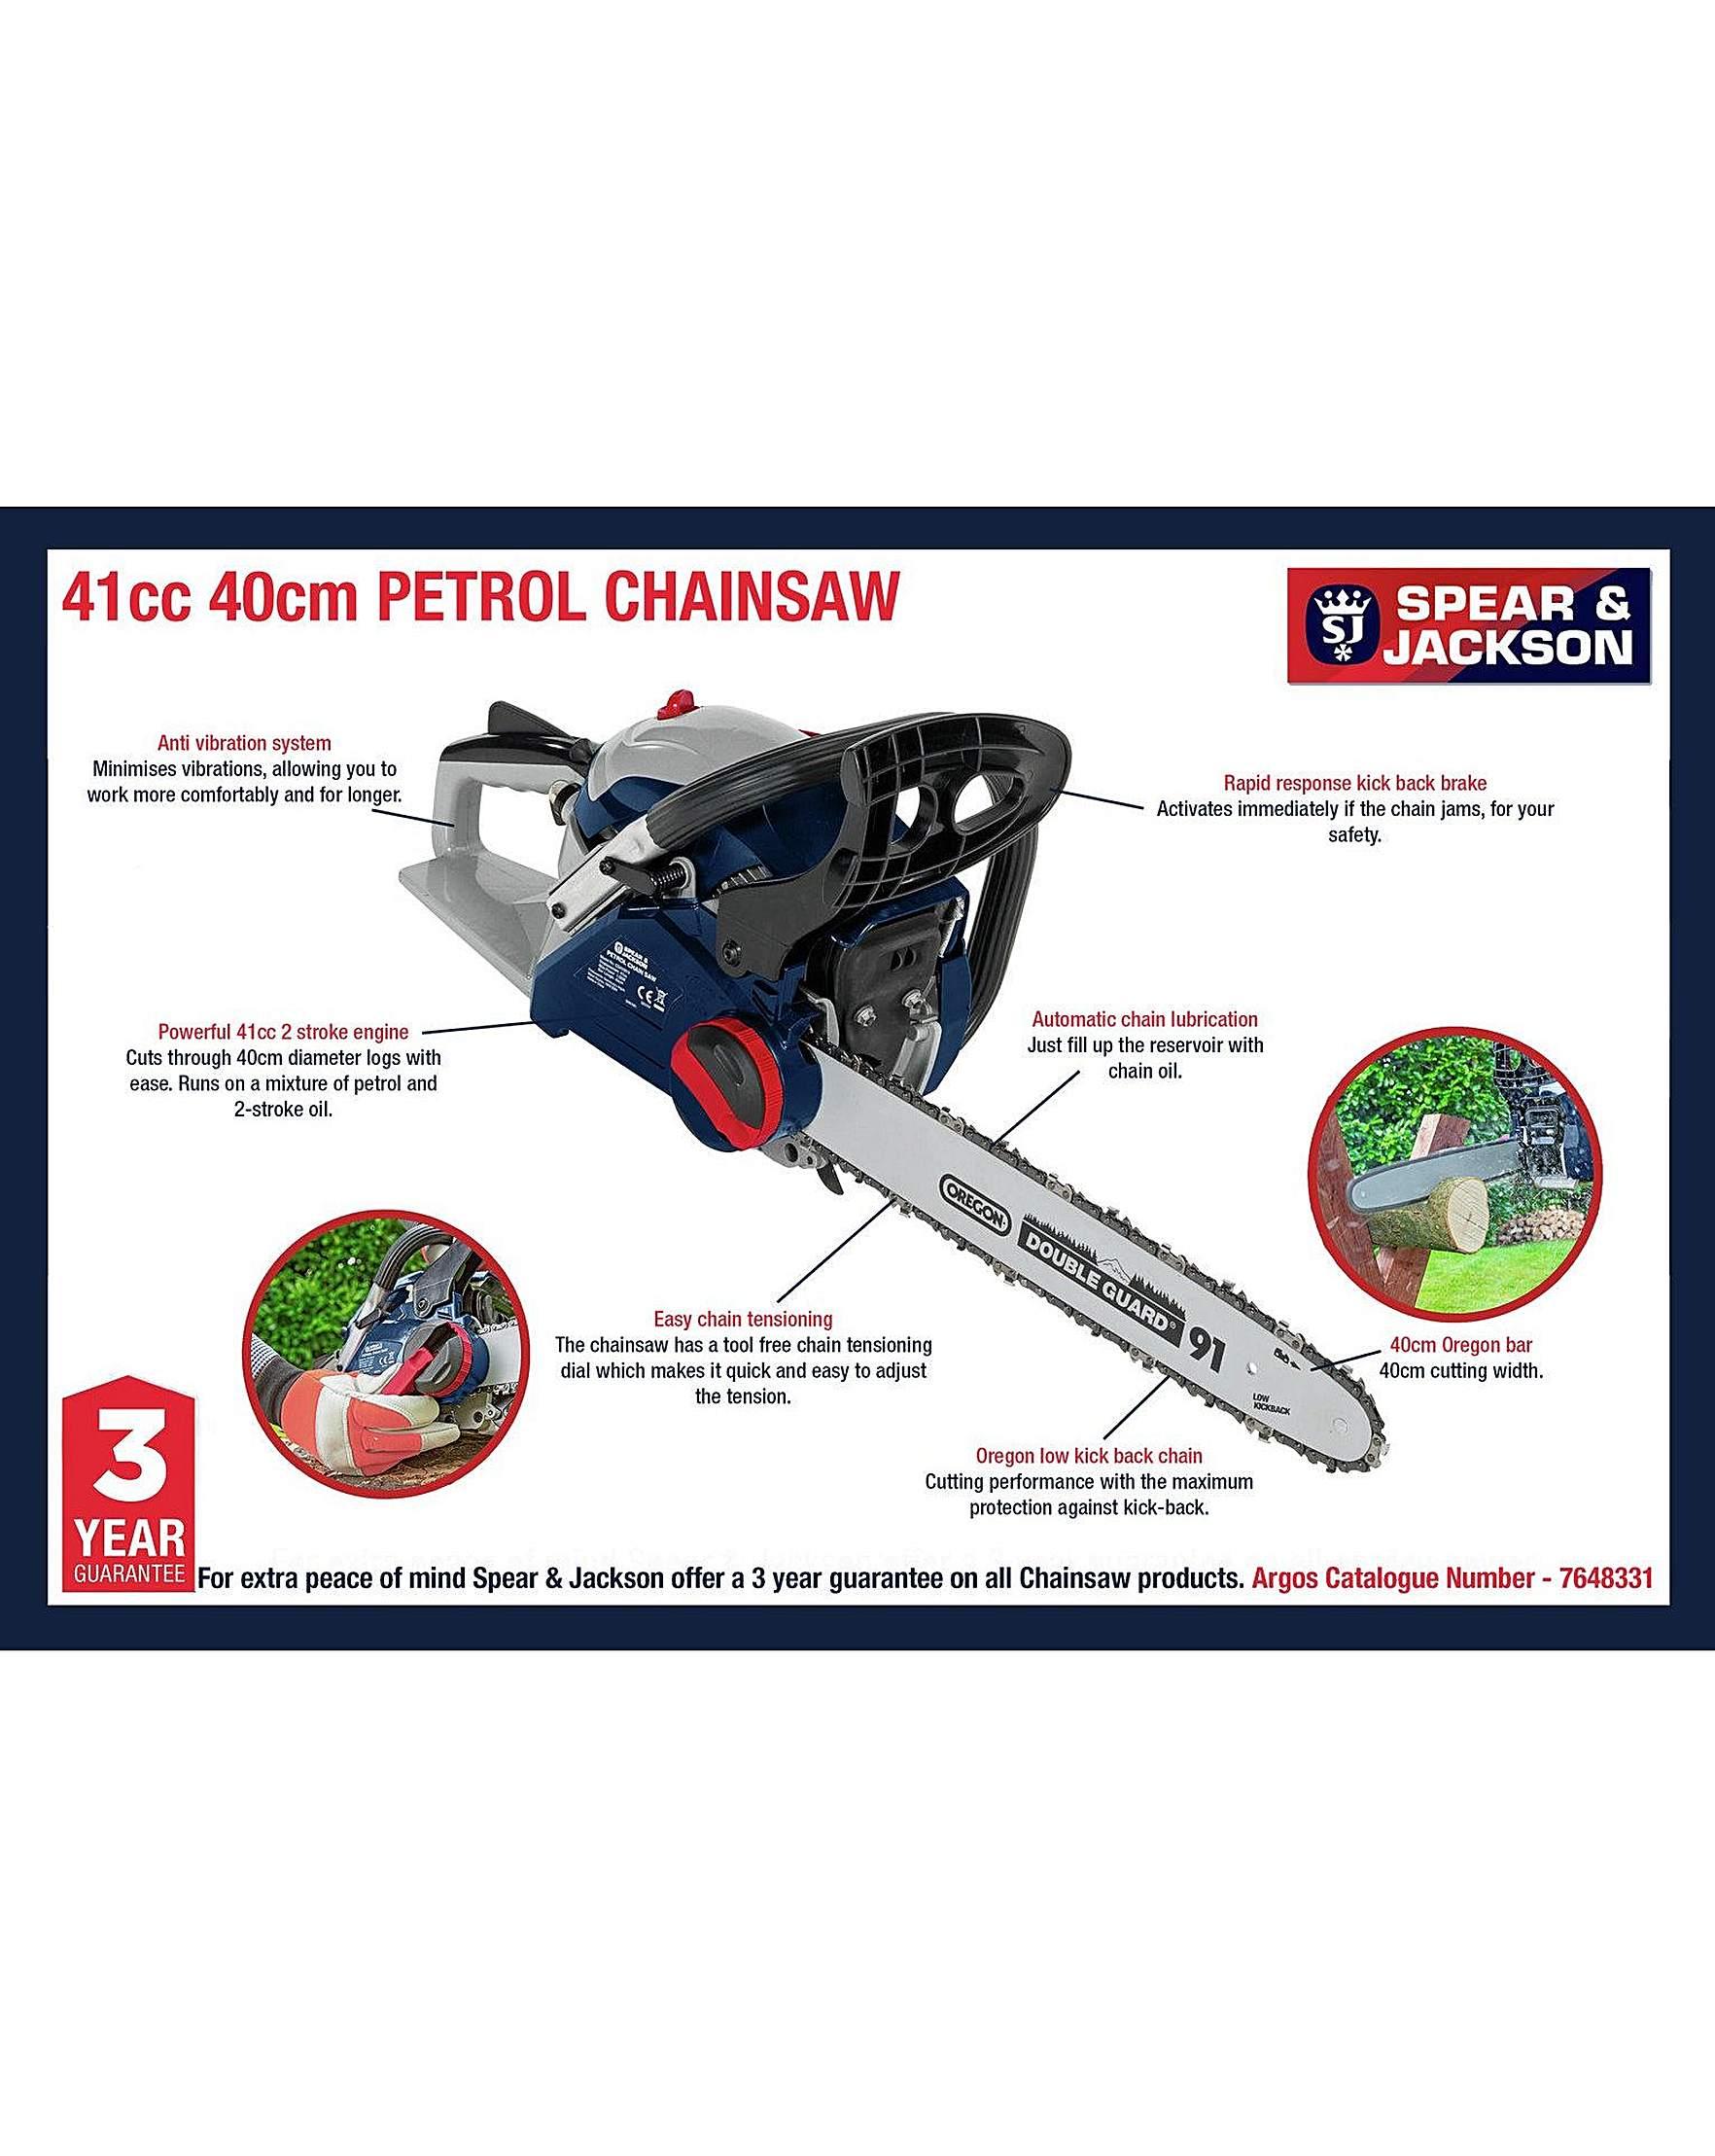 S4140PC 40cm Petrol Chainsaw